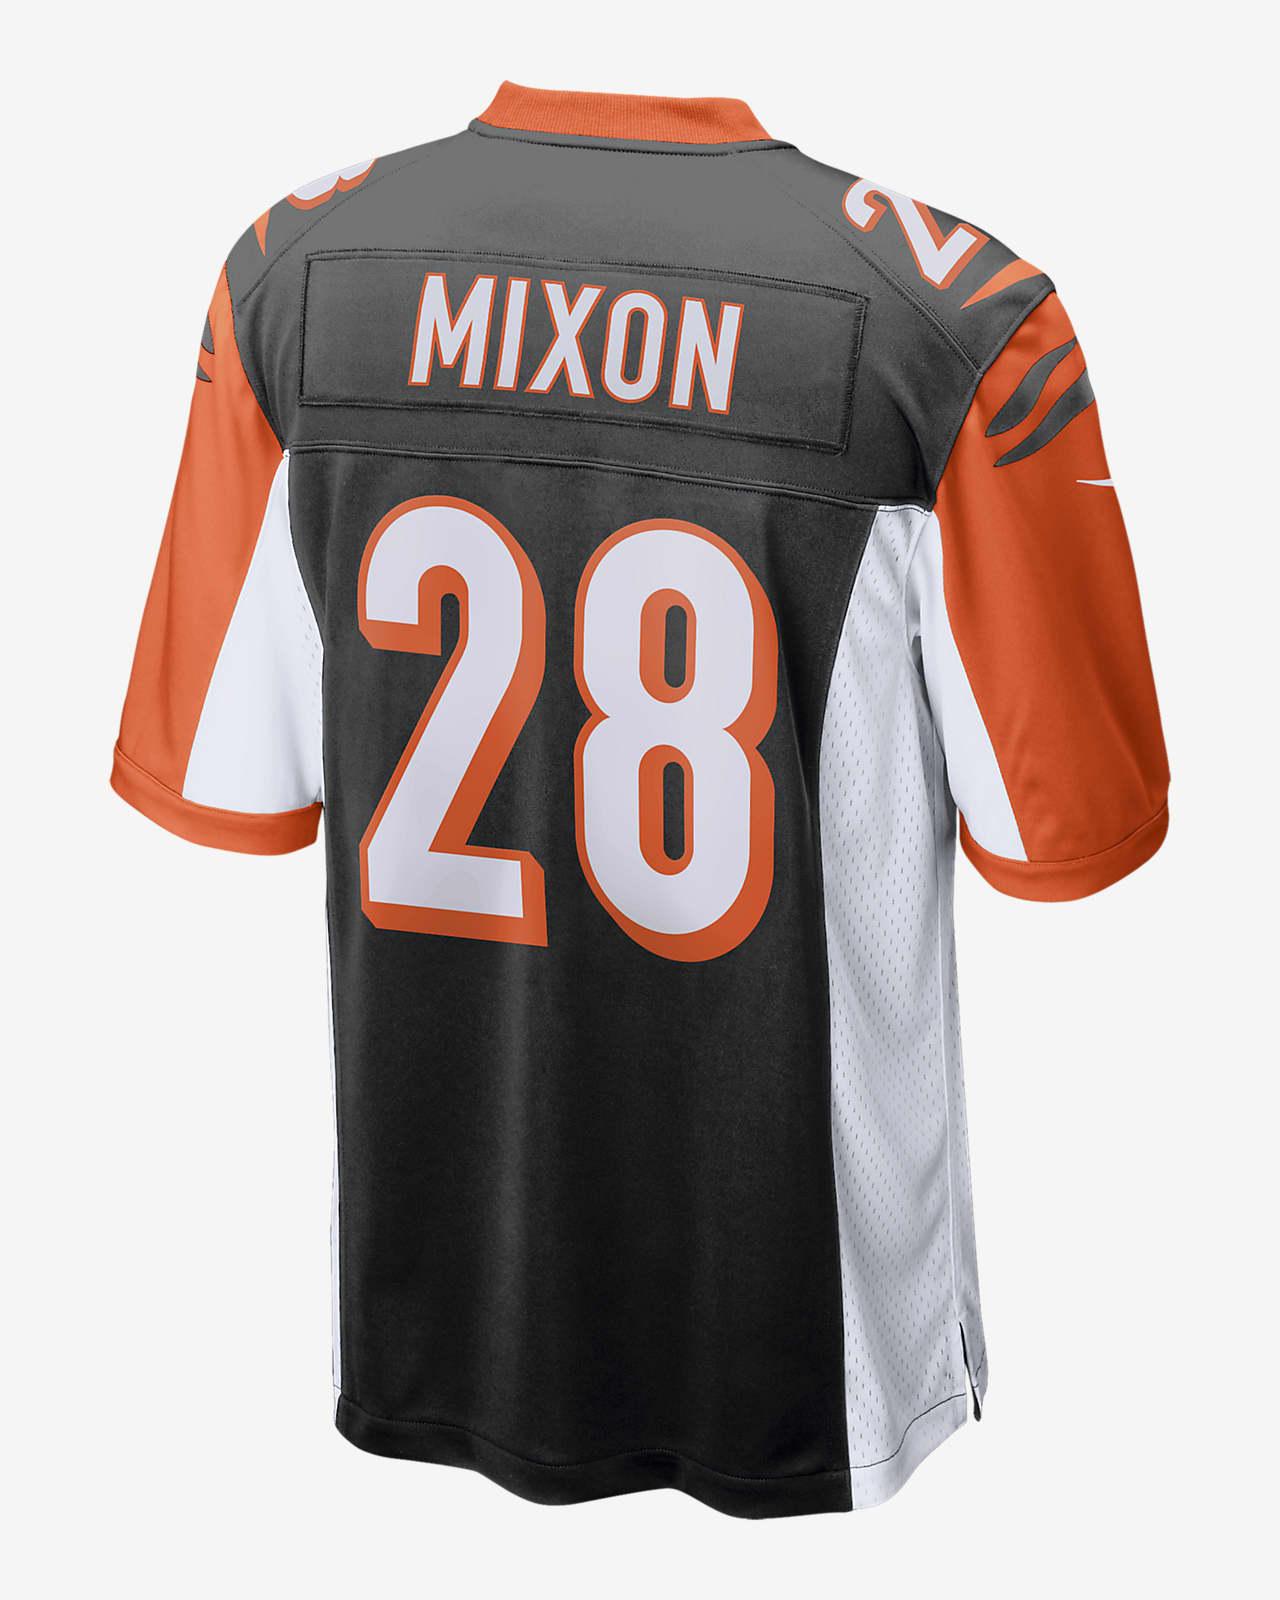 NFL Cincinnati Bengals (Joe Mixon) Men's Game American Football Jersey